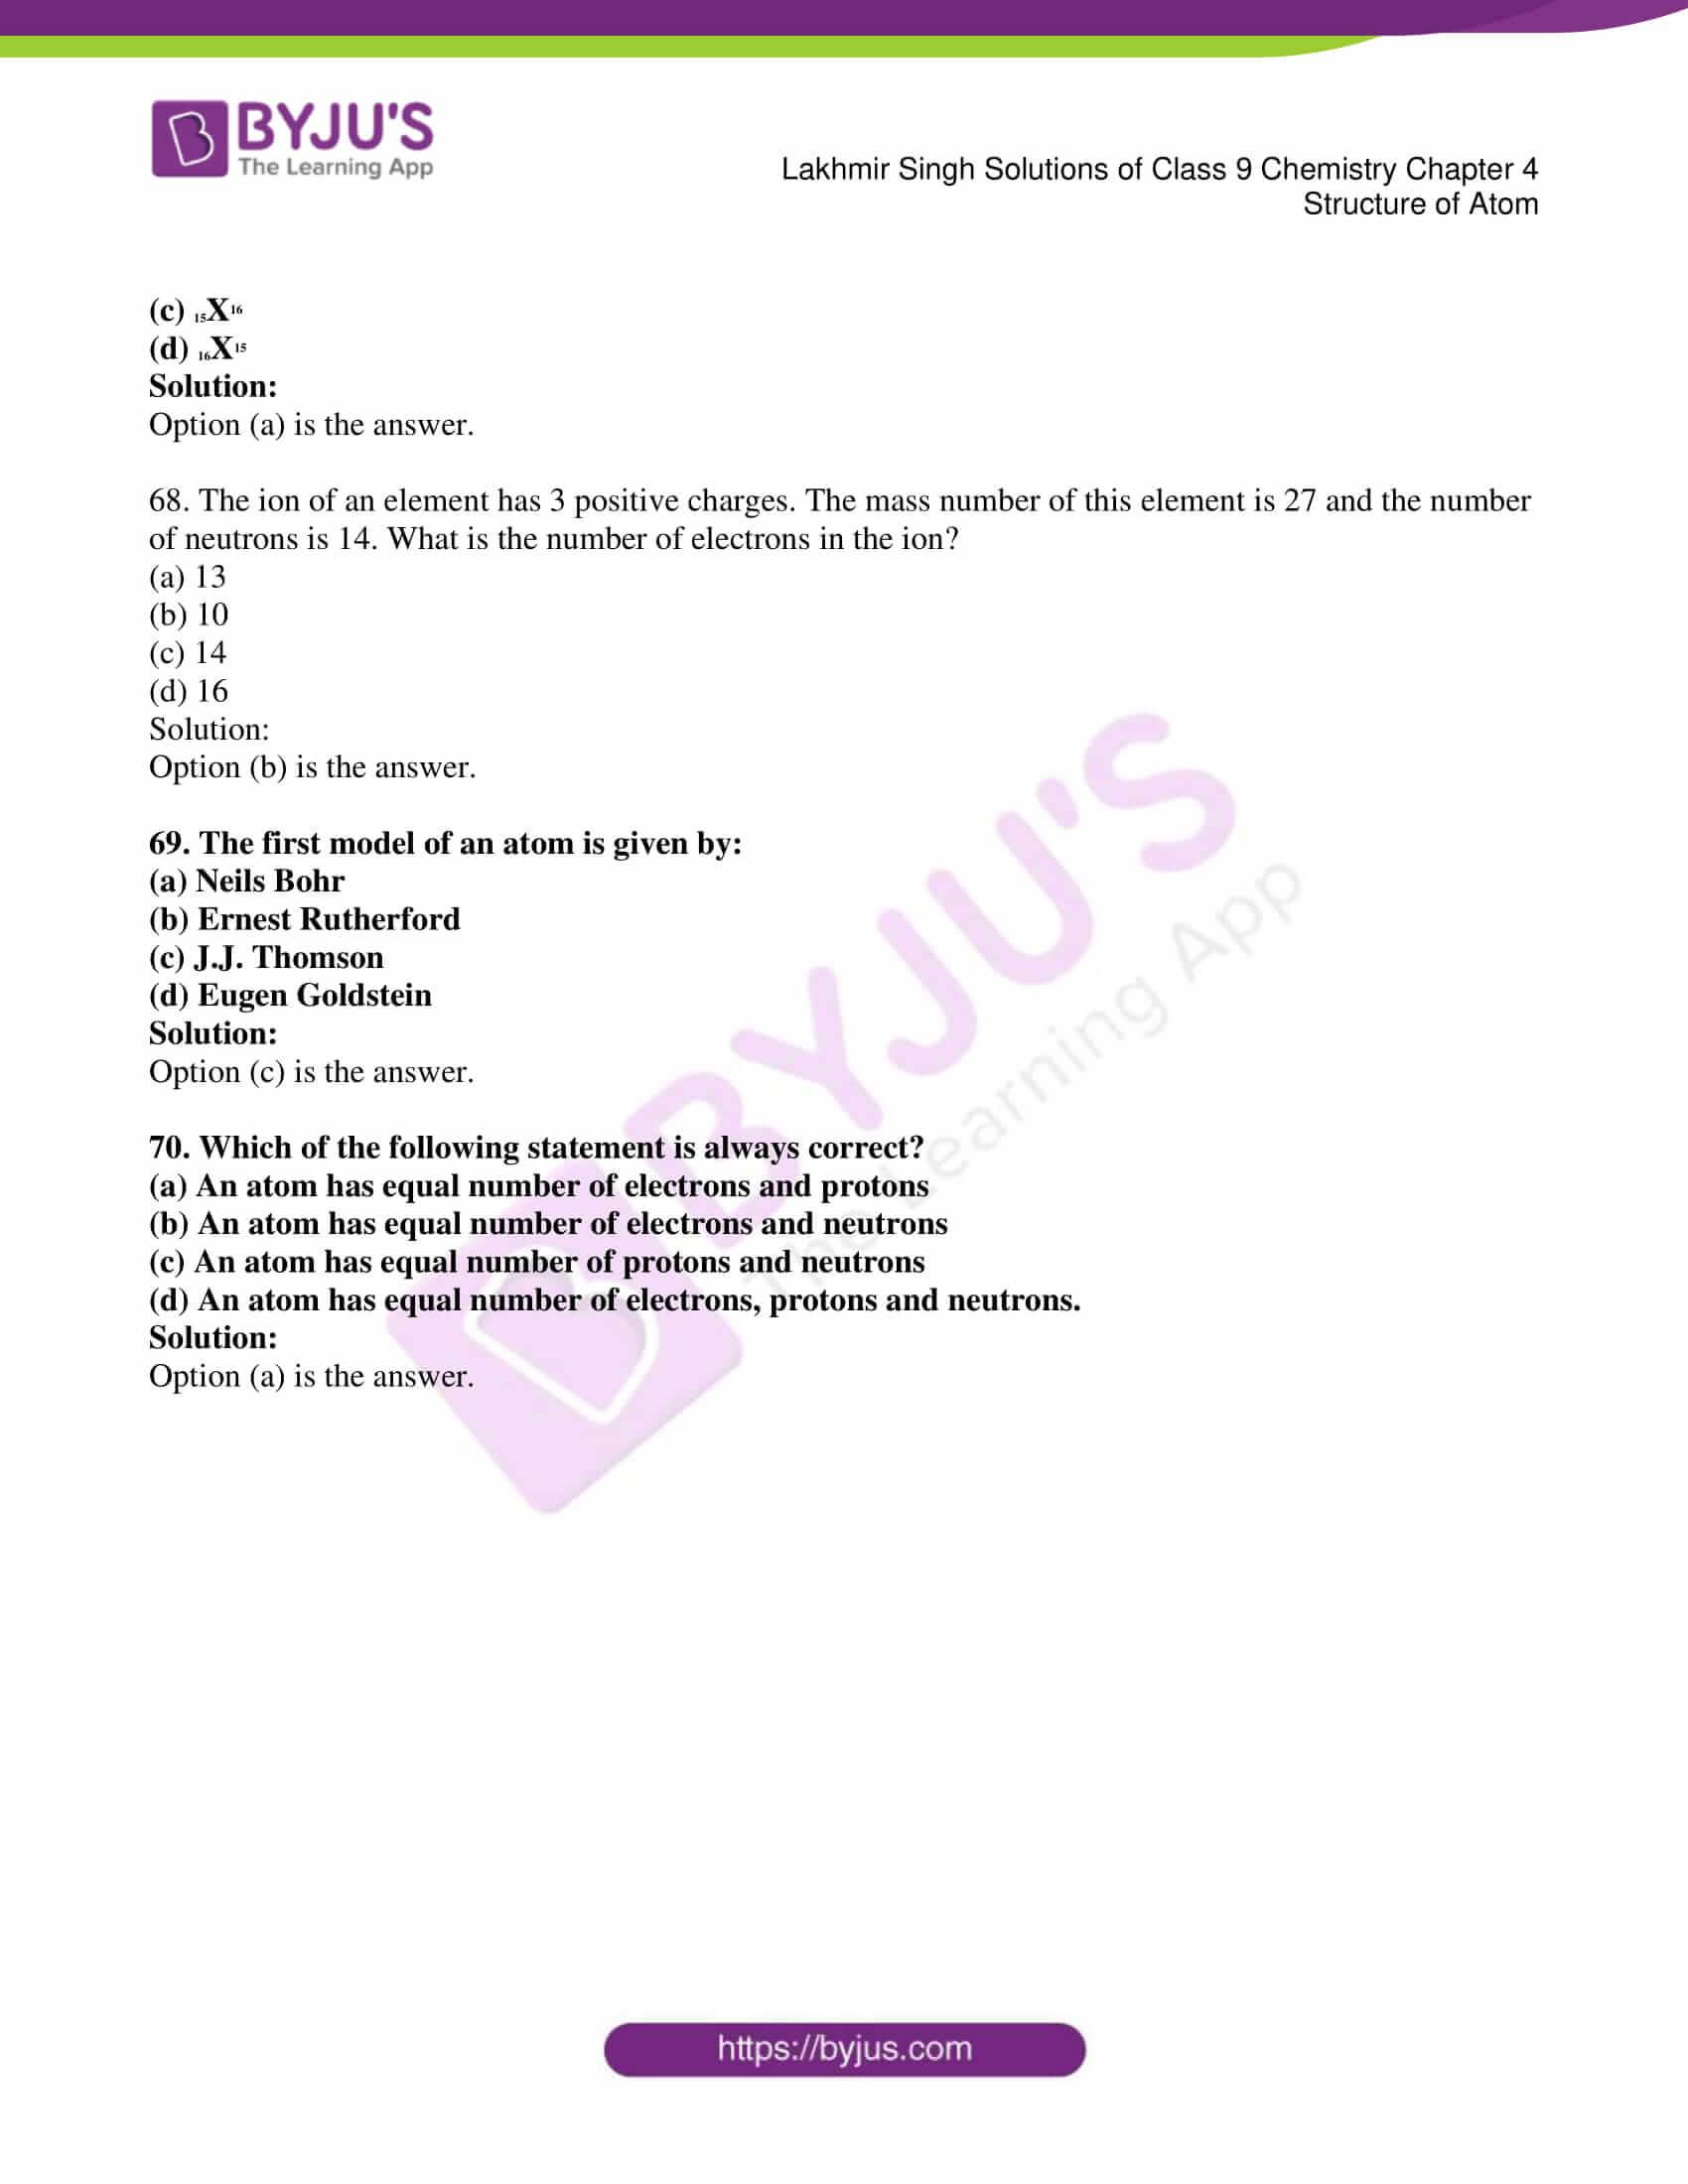 lakhmir singh solutions class 9 chemistry chapter 4 13